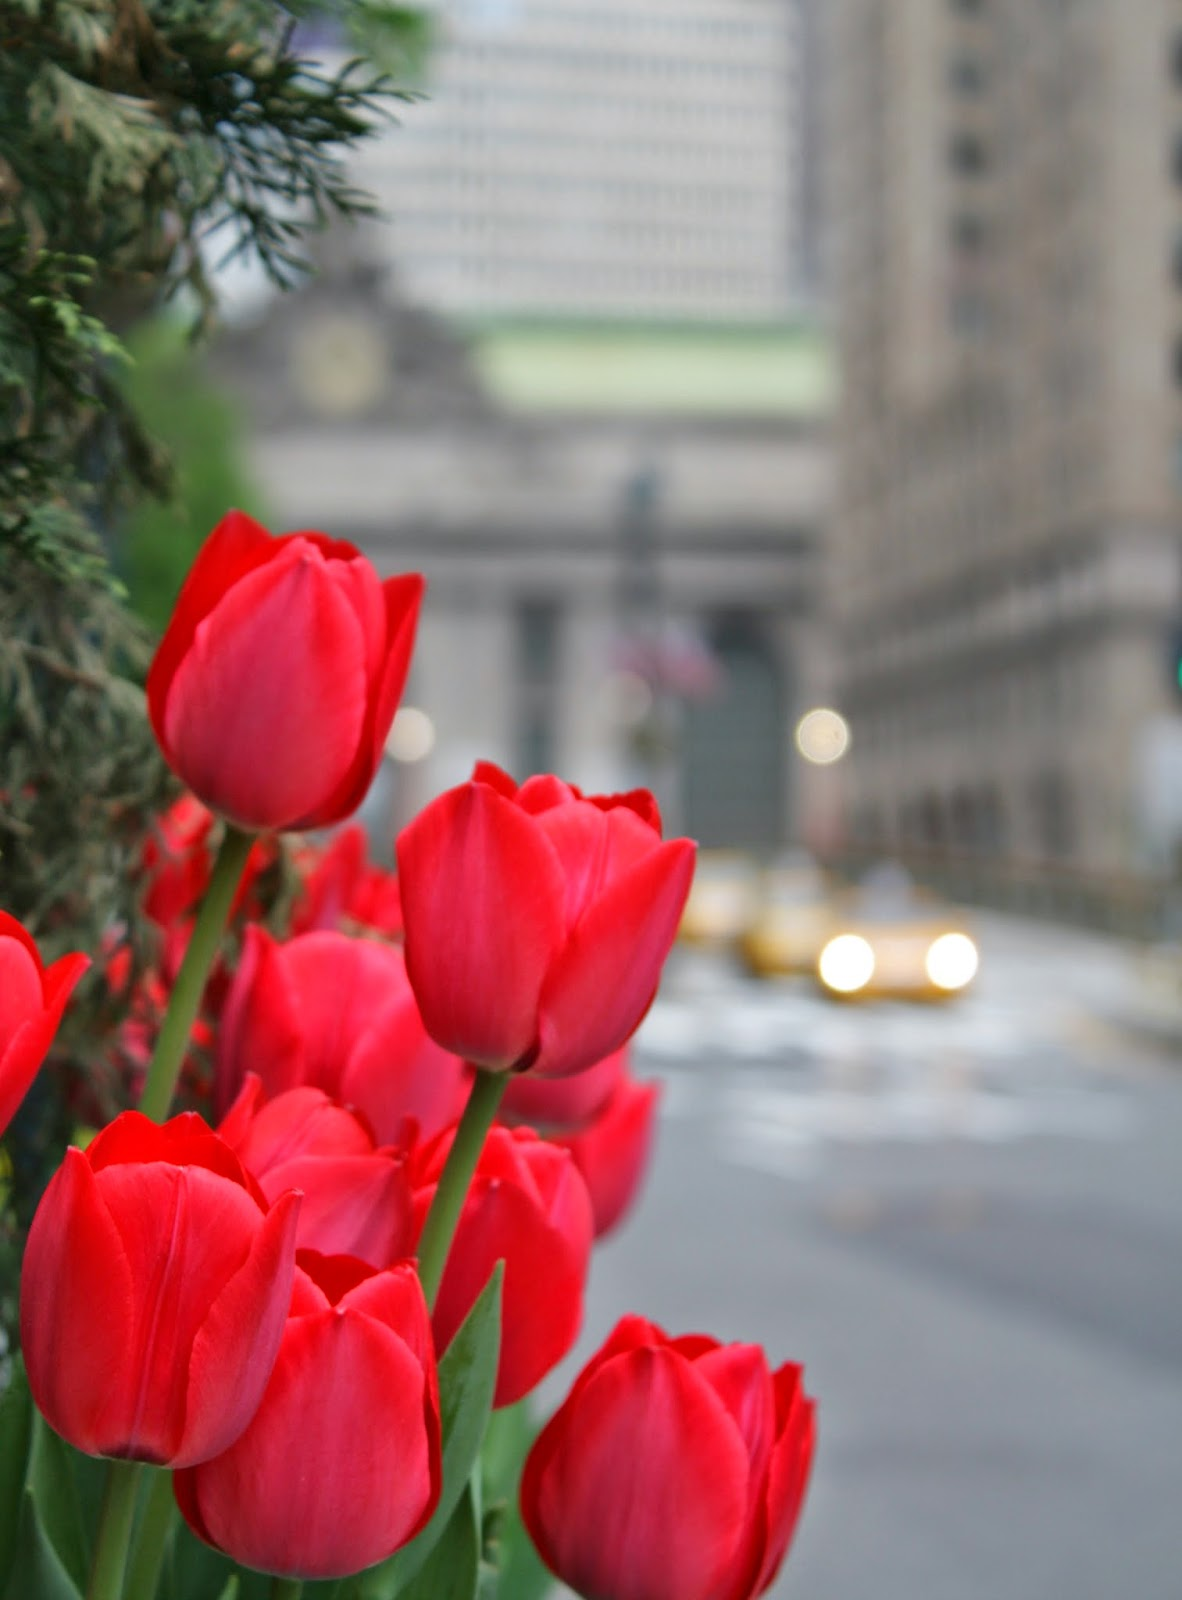 Tulipanes en New York